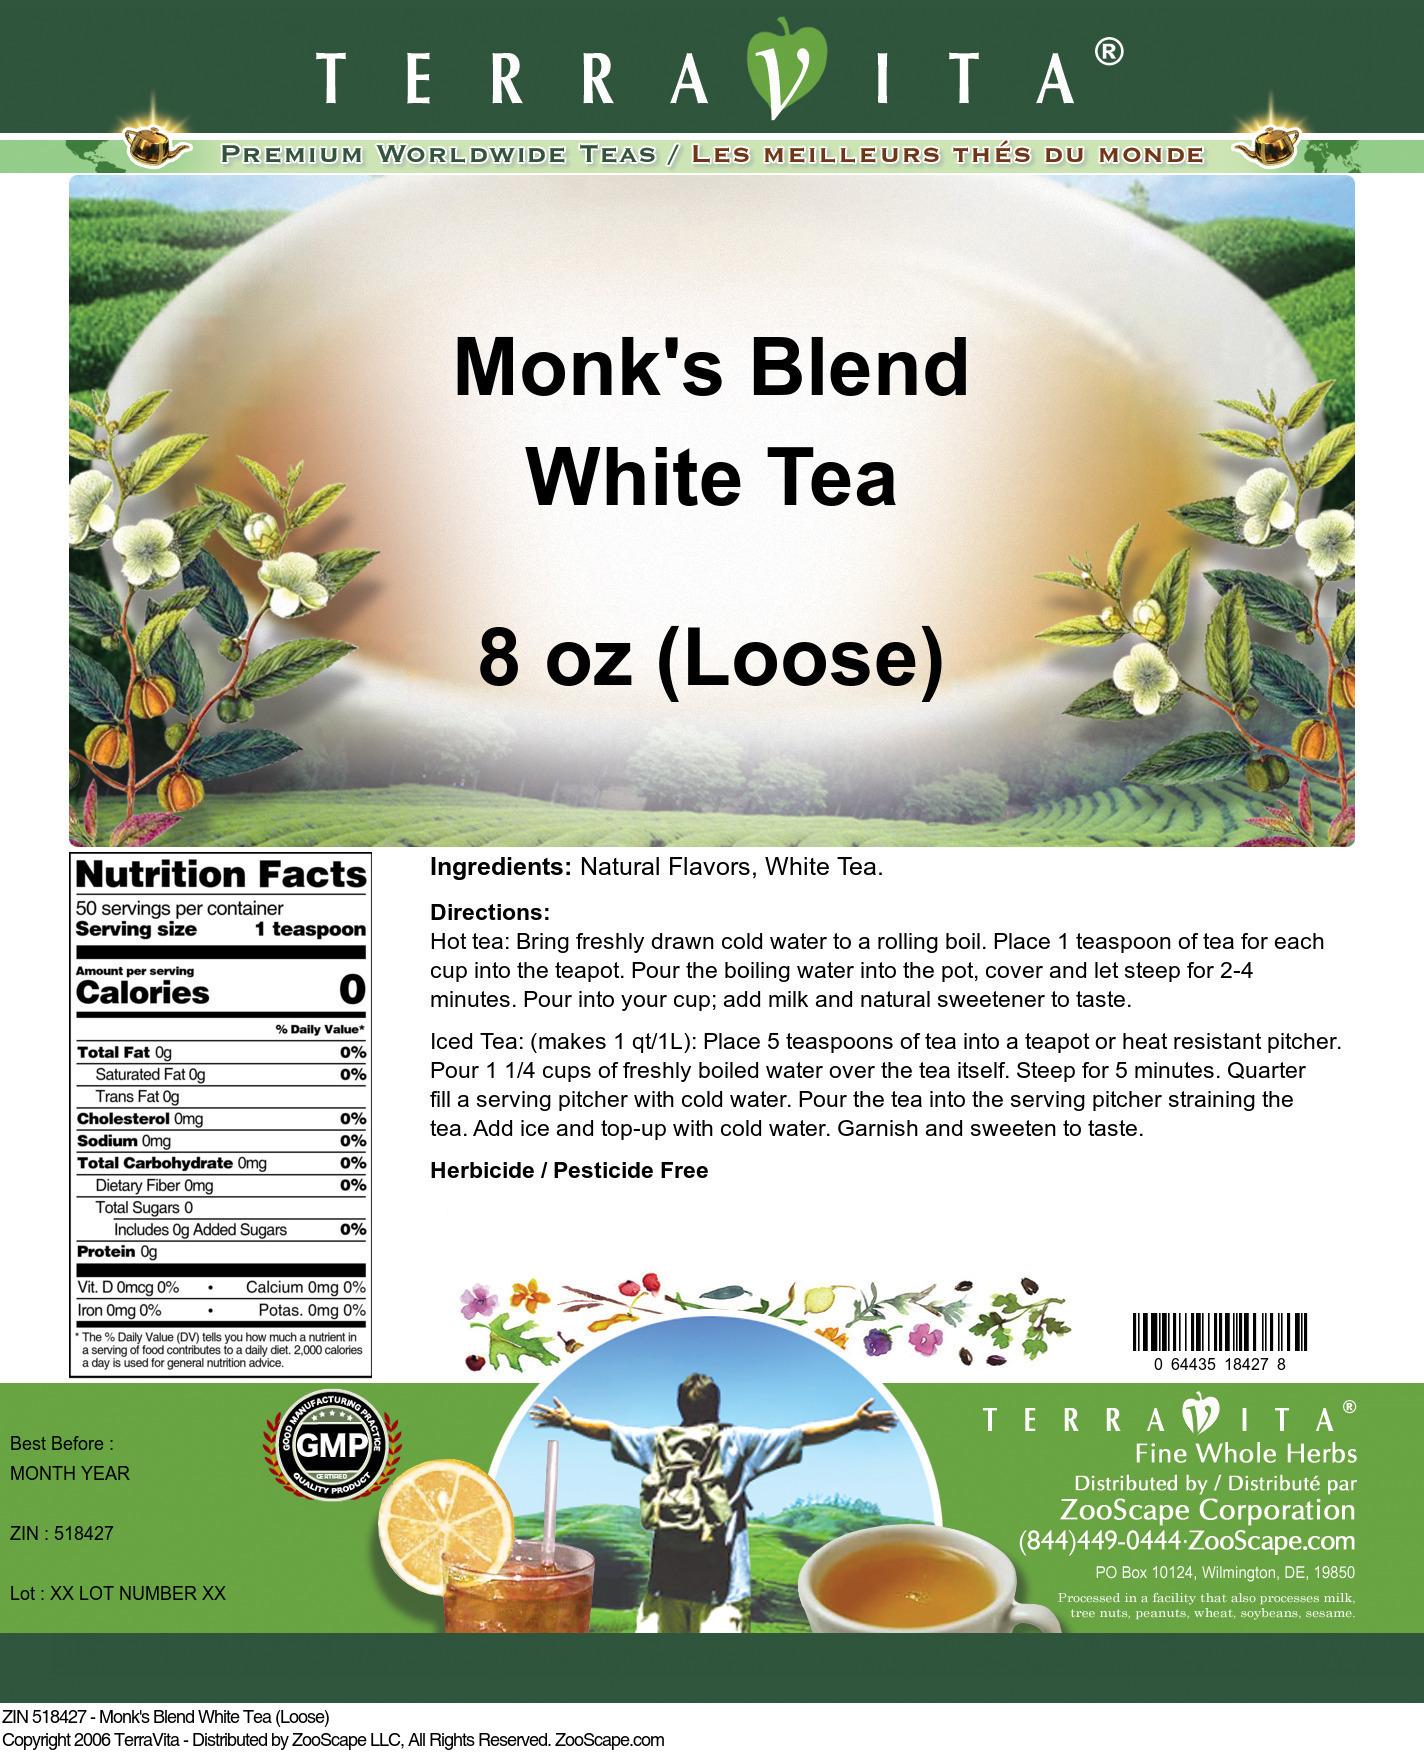 Monk's Blend White Tea